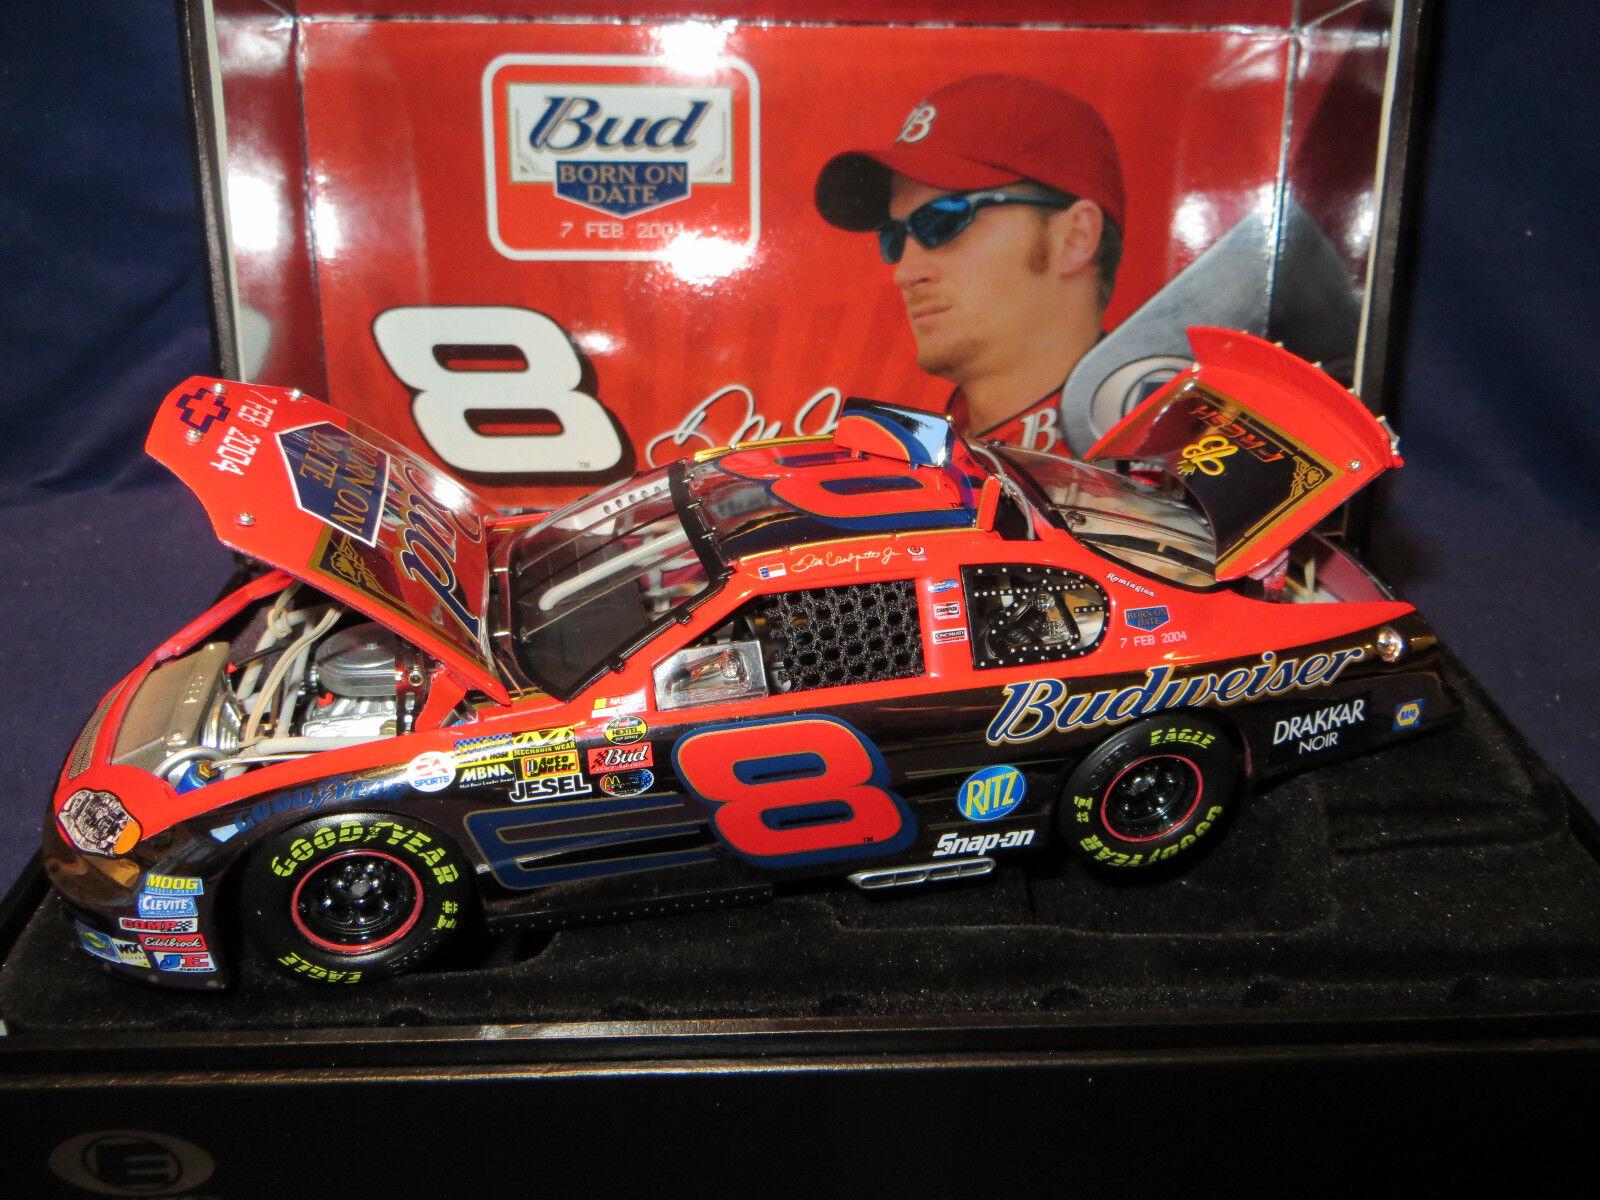 Dale Earnhardt Earnhardt Earnhardt Jr Budweiser   Born On Date  408 2004 1 24 PLATINUM Elite 9d92b0